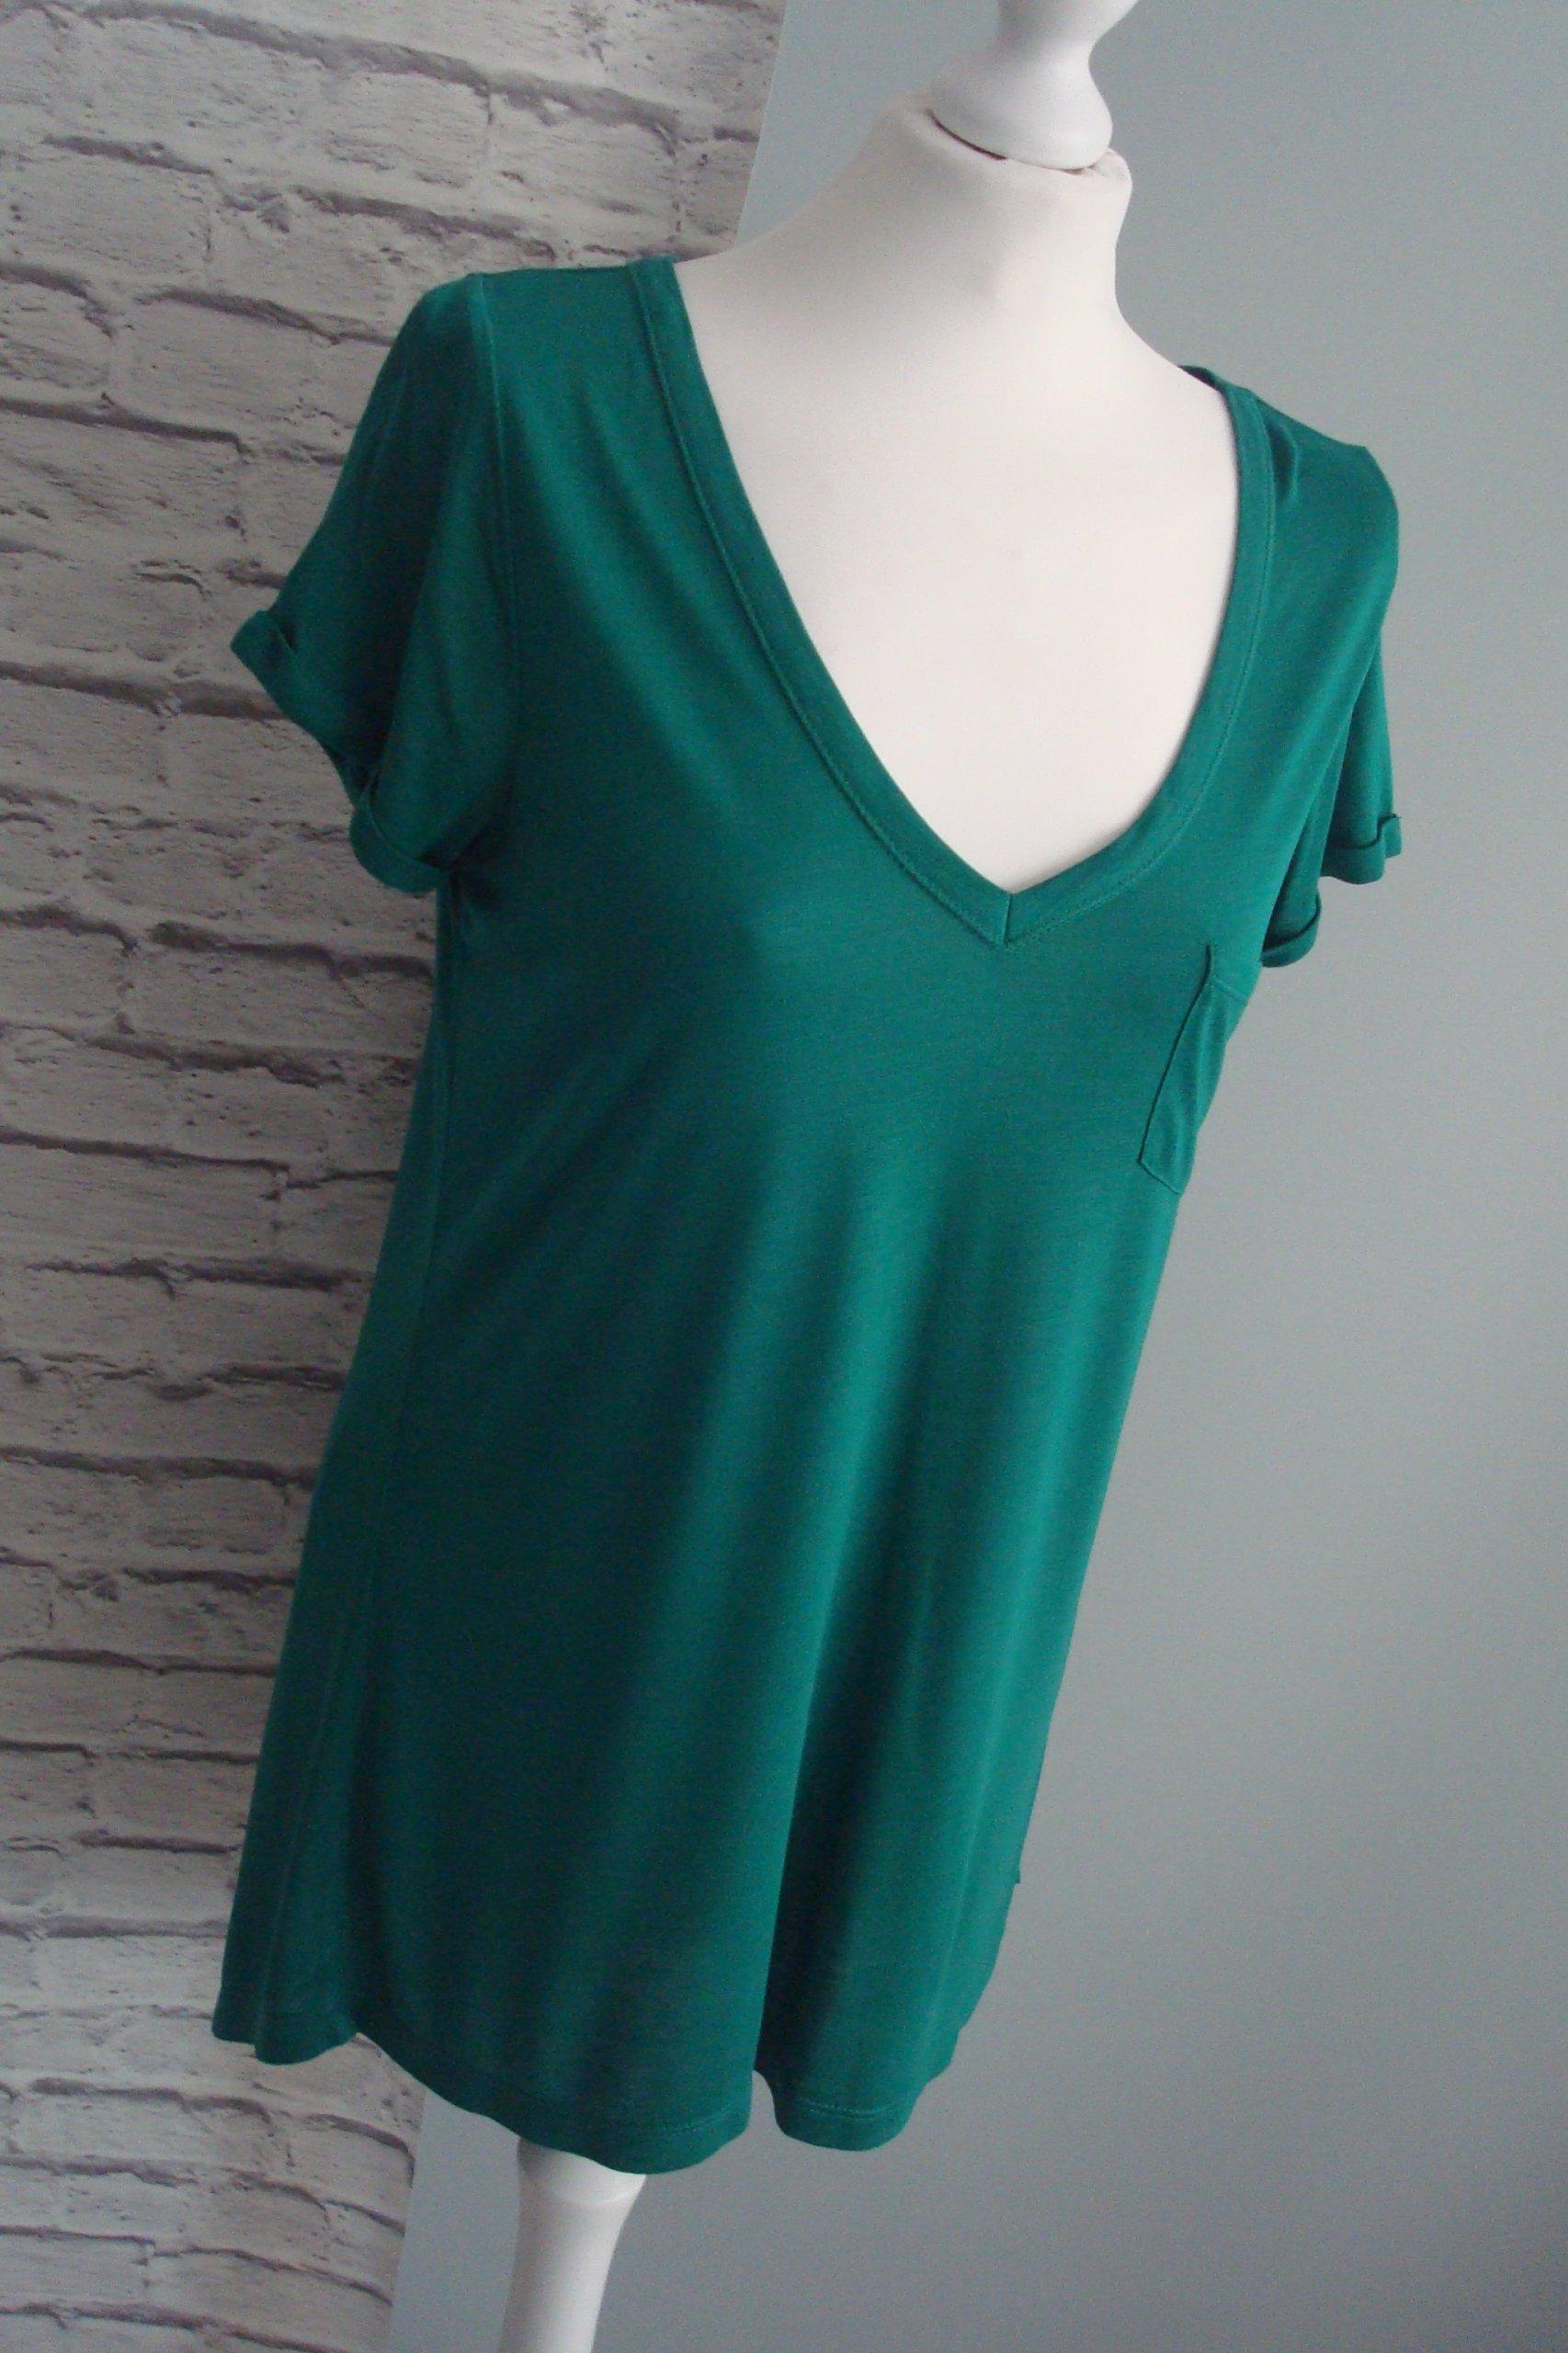 e38b6b4a7a AjC zielona butelkowa elegancka bluzka lato 42 44 - 7237597805 ...